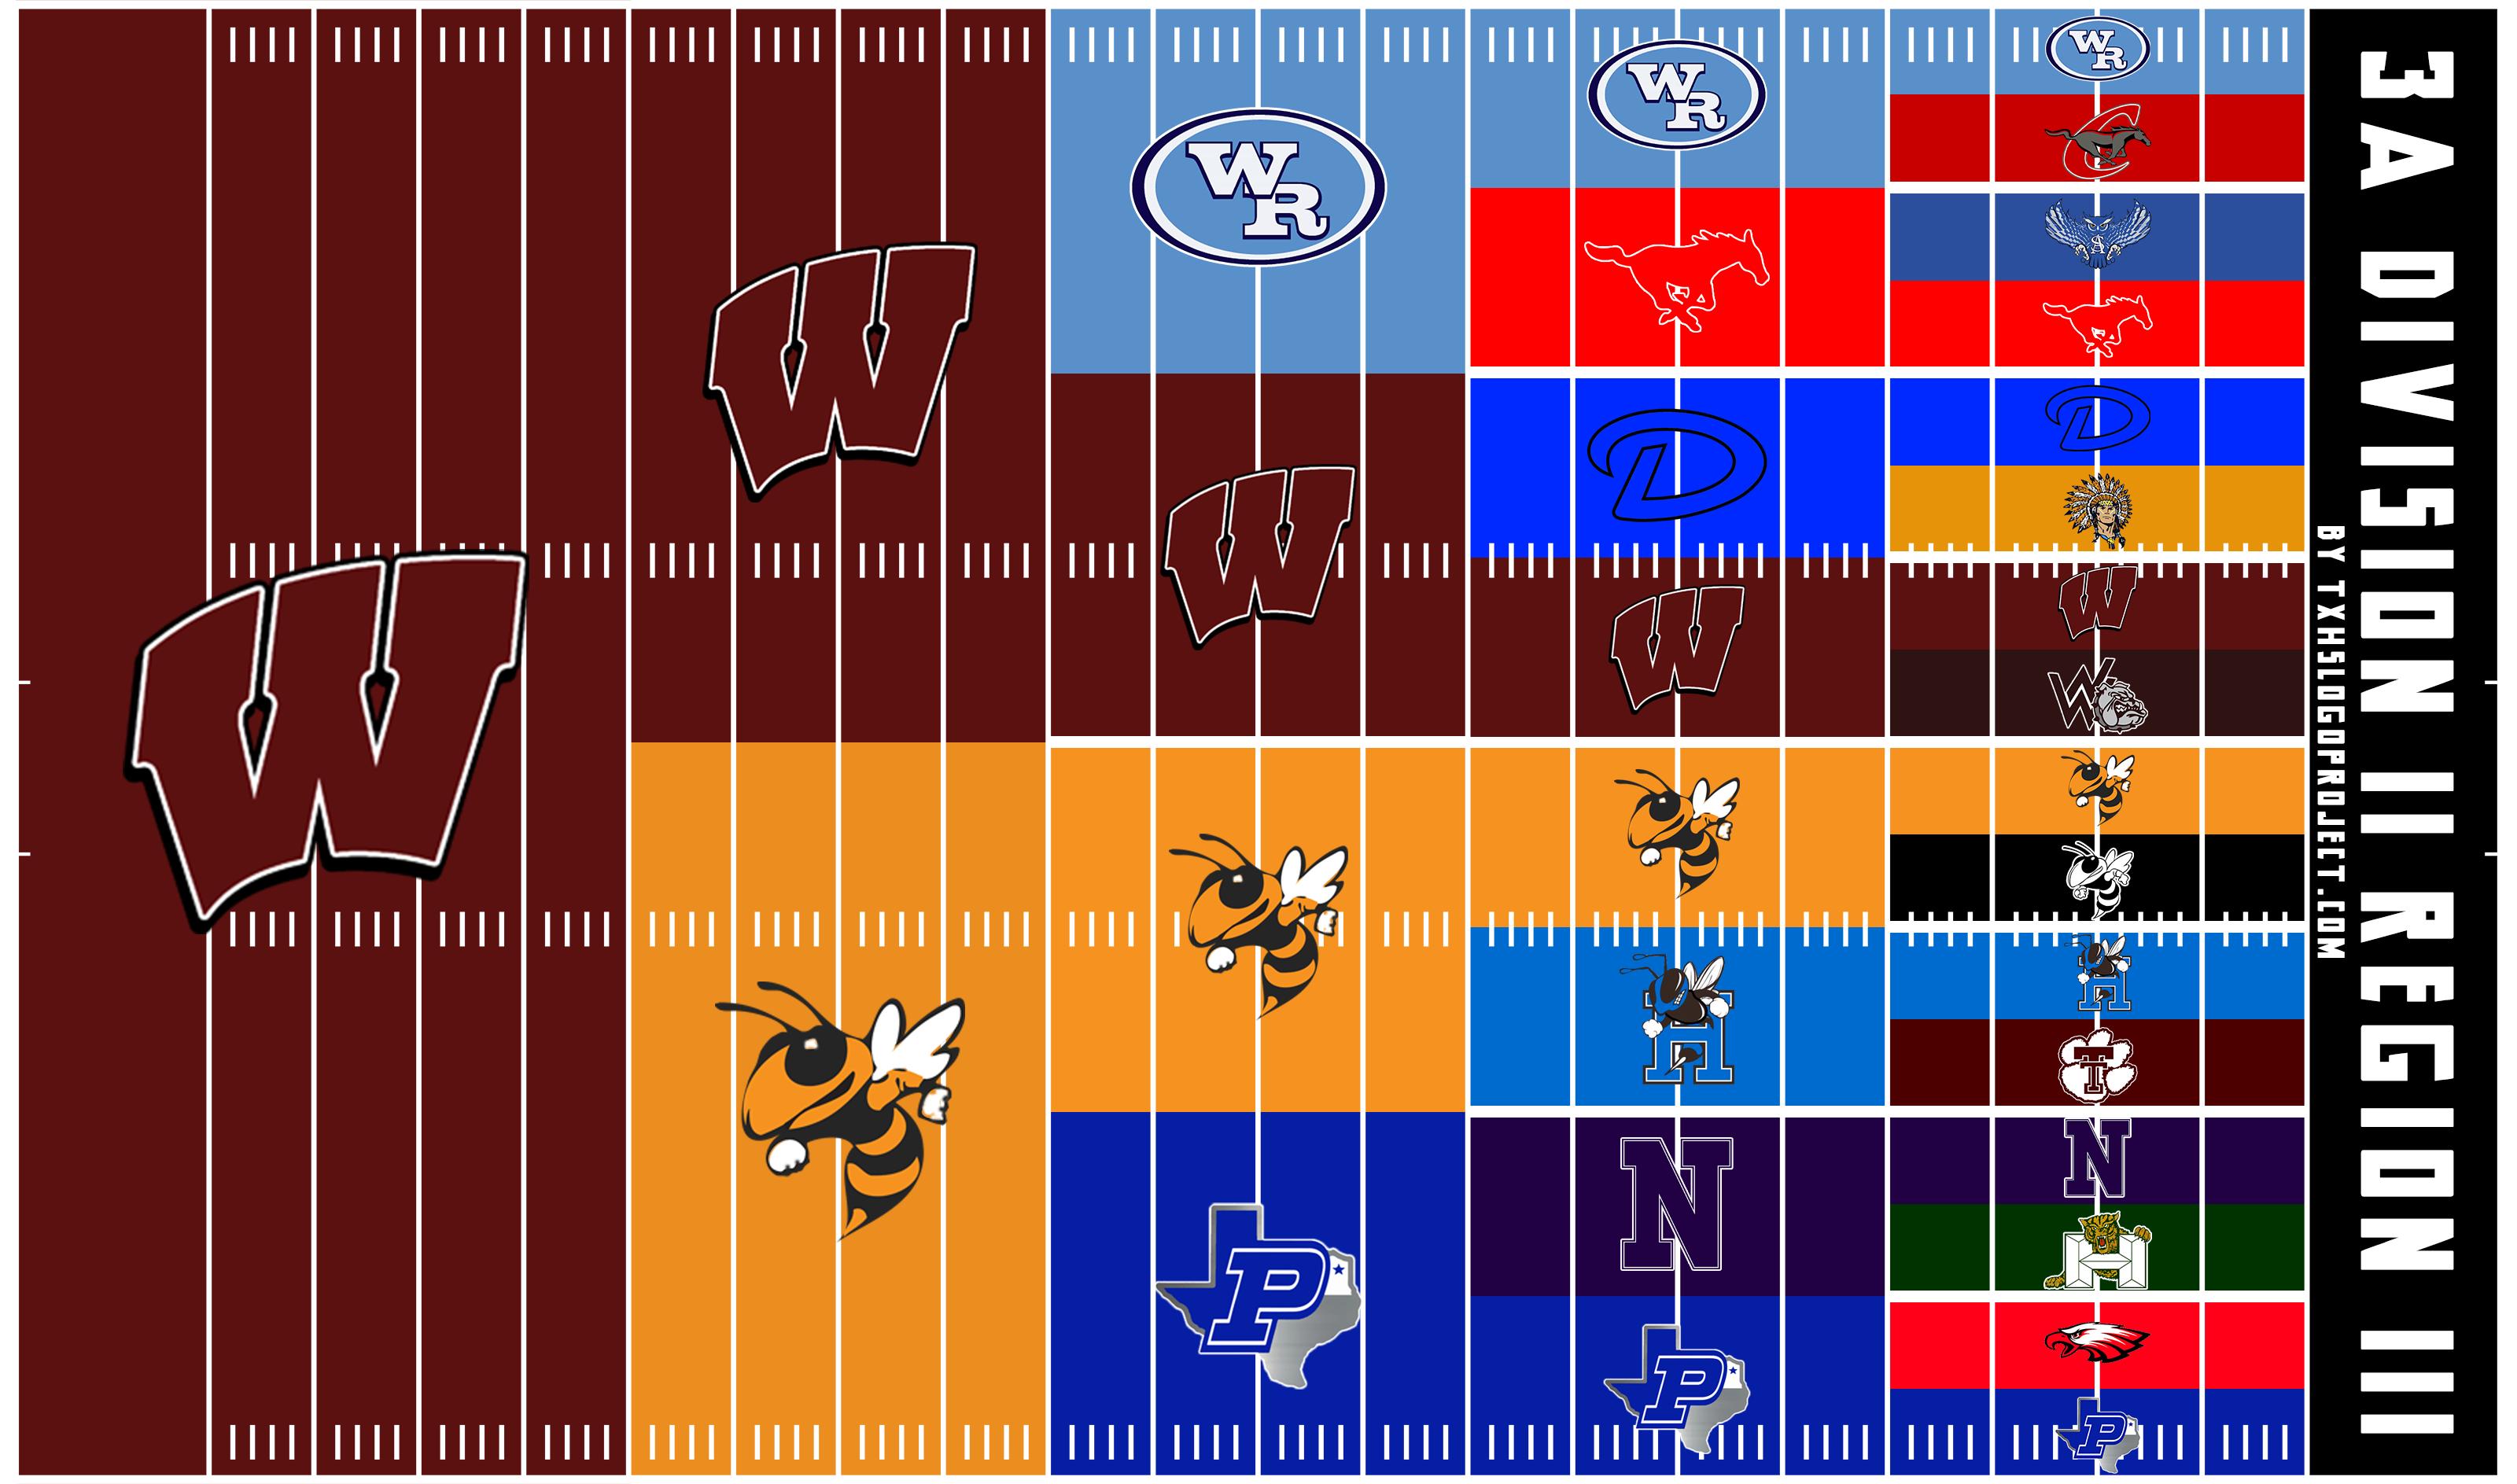 3A Division II Region III